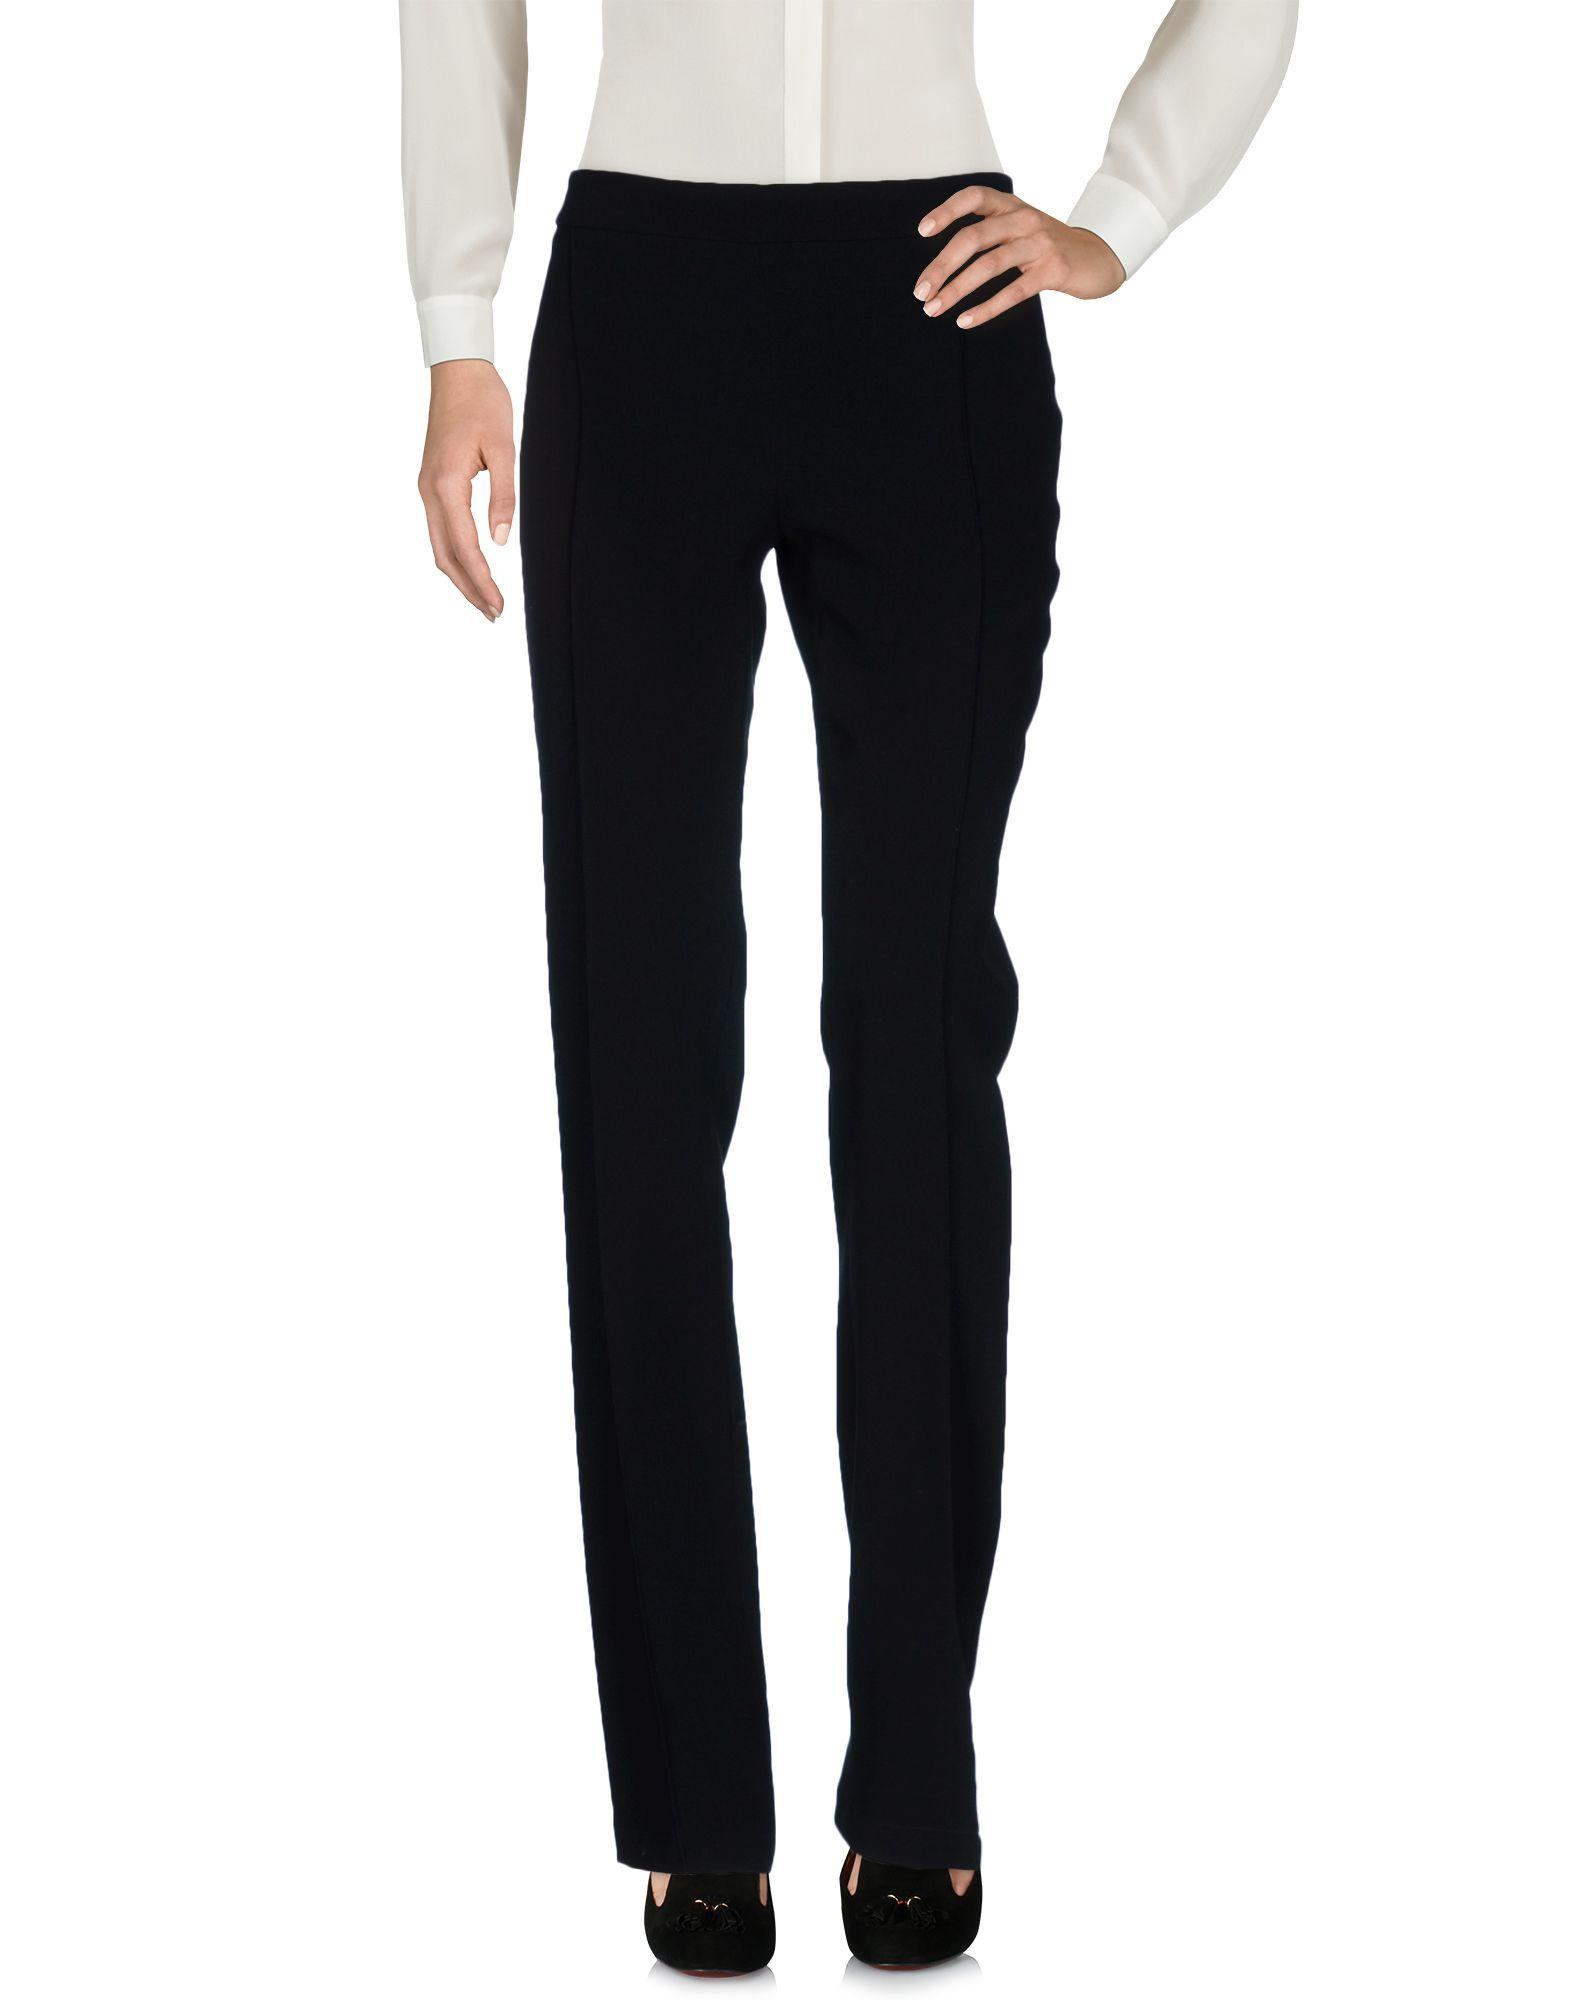 ELISABETTA FRANCHI 24 ORE Повседневные брюки elisabetta franchi 24 ore повседневные брюки page 6